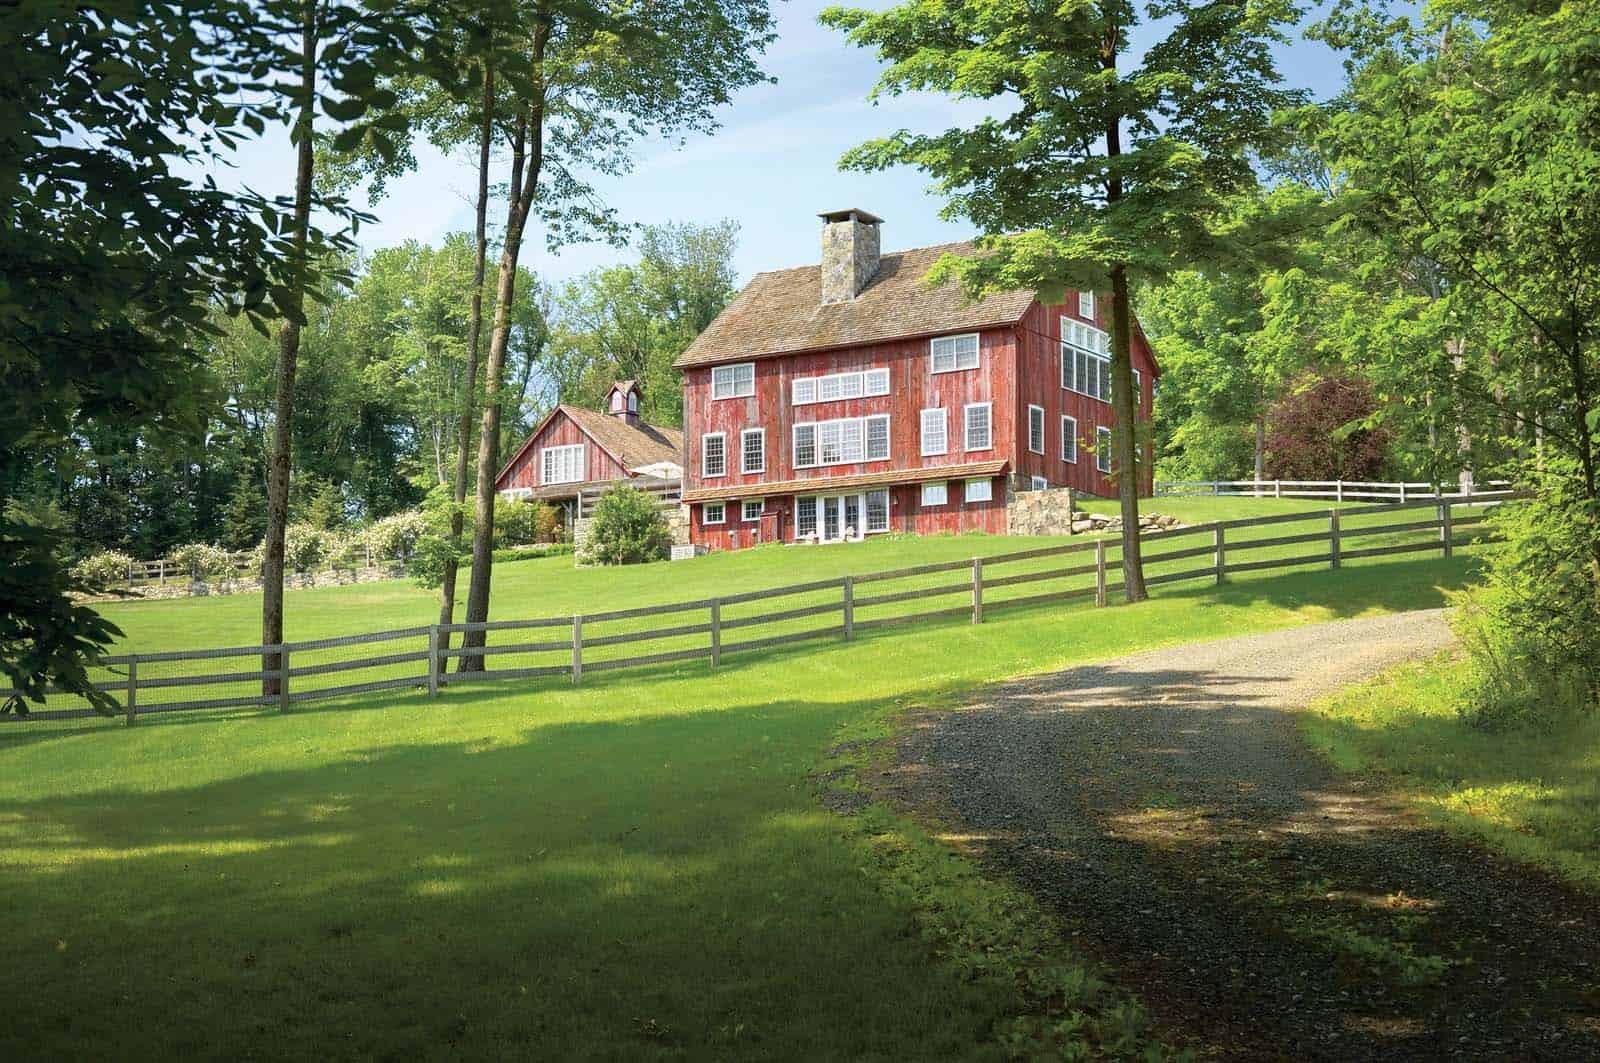 modern-rustic-barn-exterior